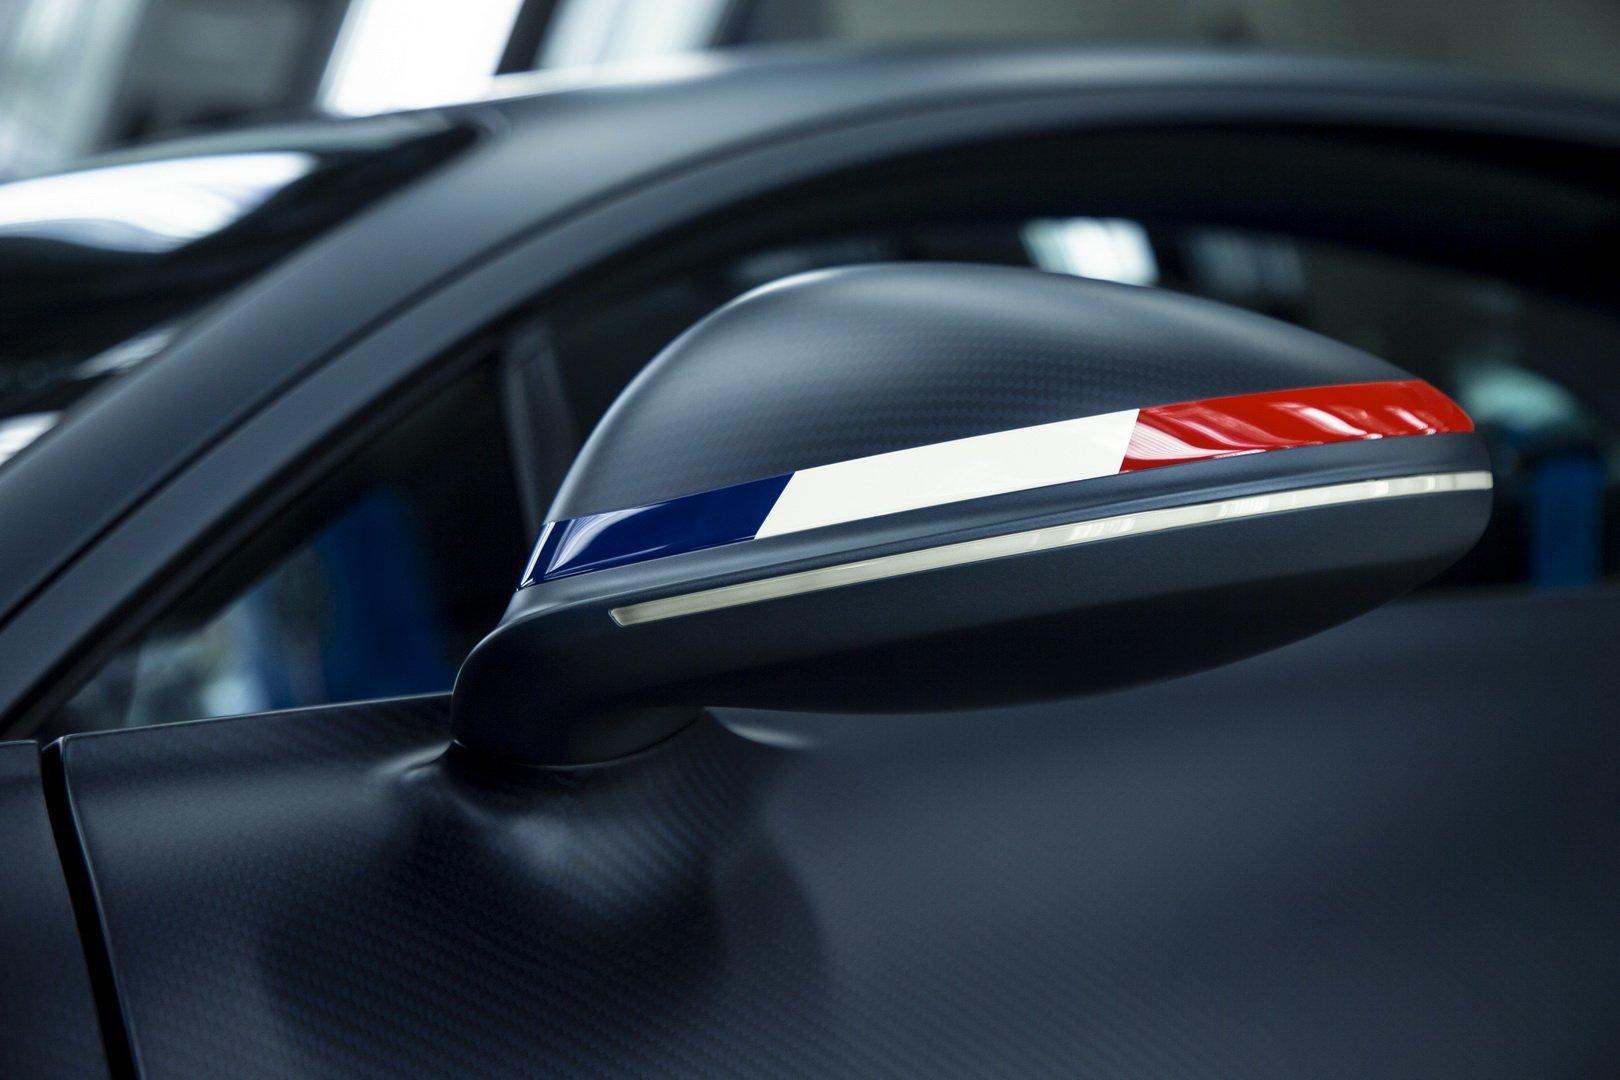 Bugatti,siêu xe